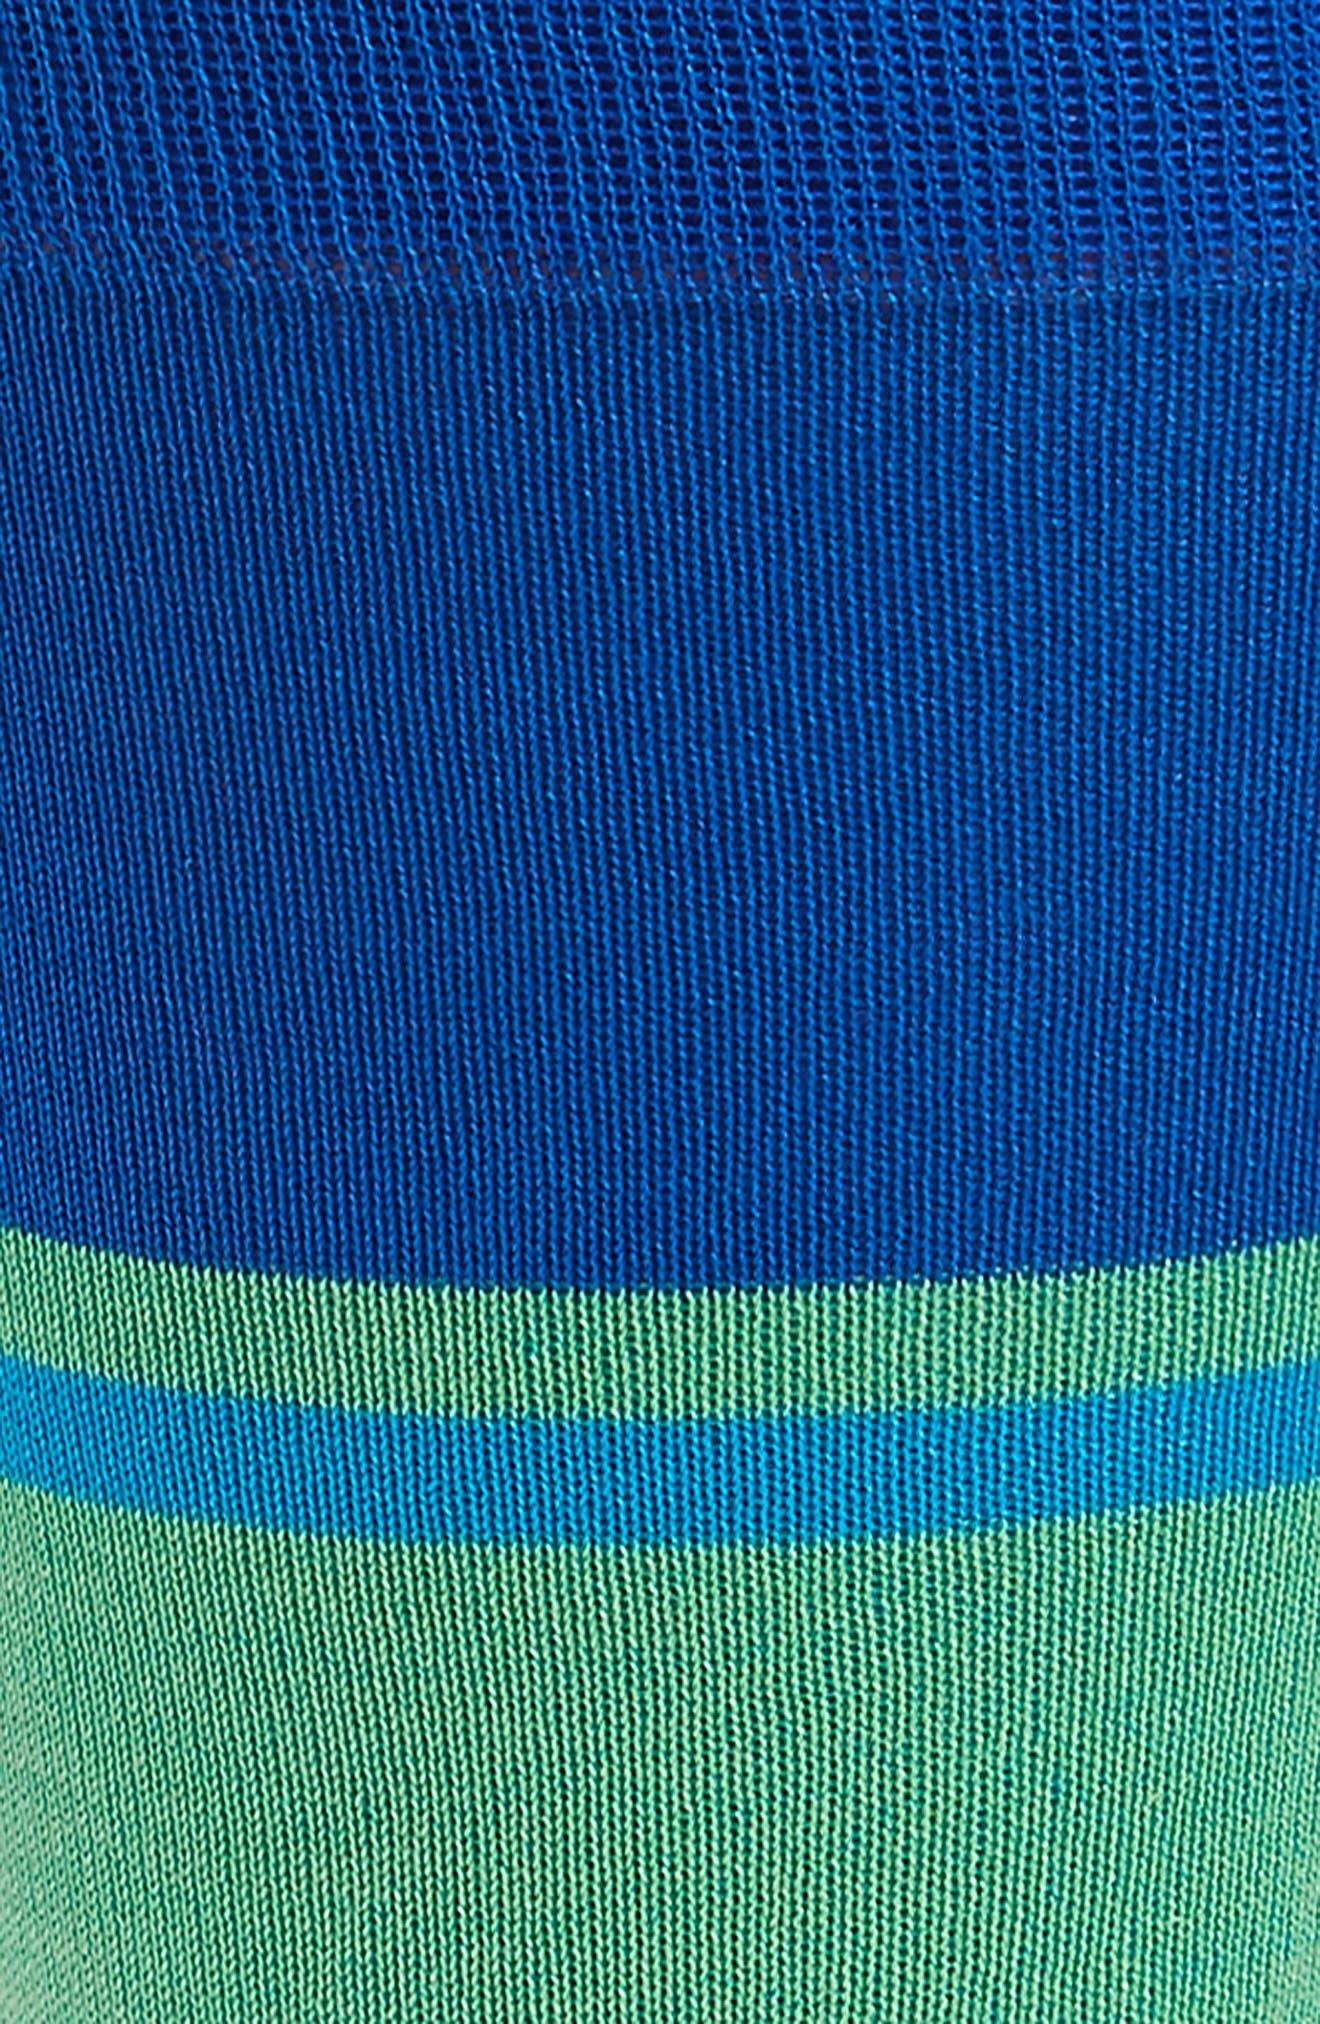 Block Stripe Socks,                             Alternate thumbnail 2, color,                             401